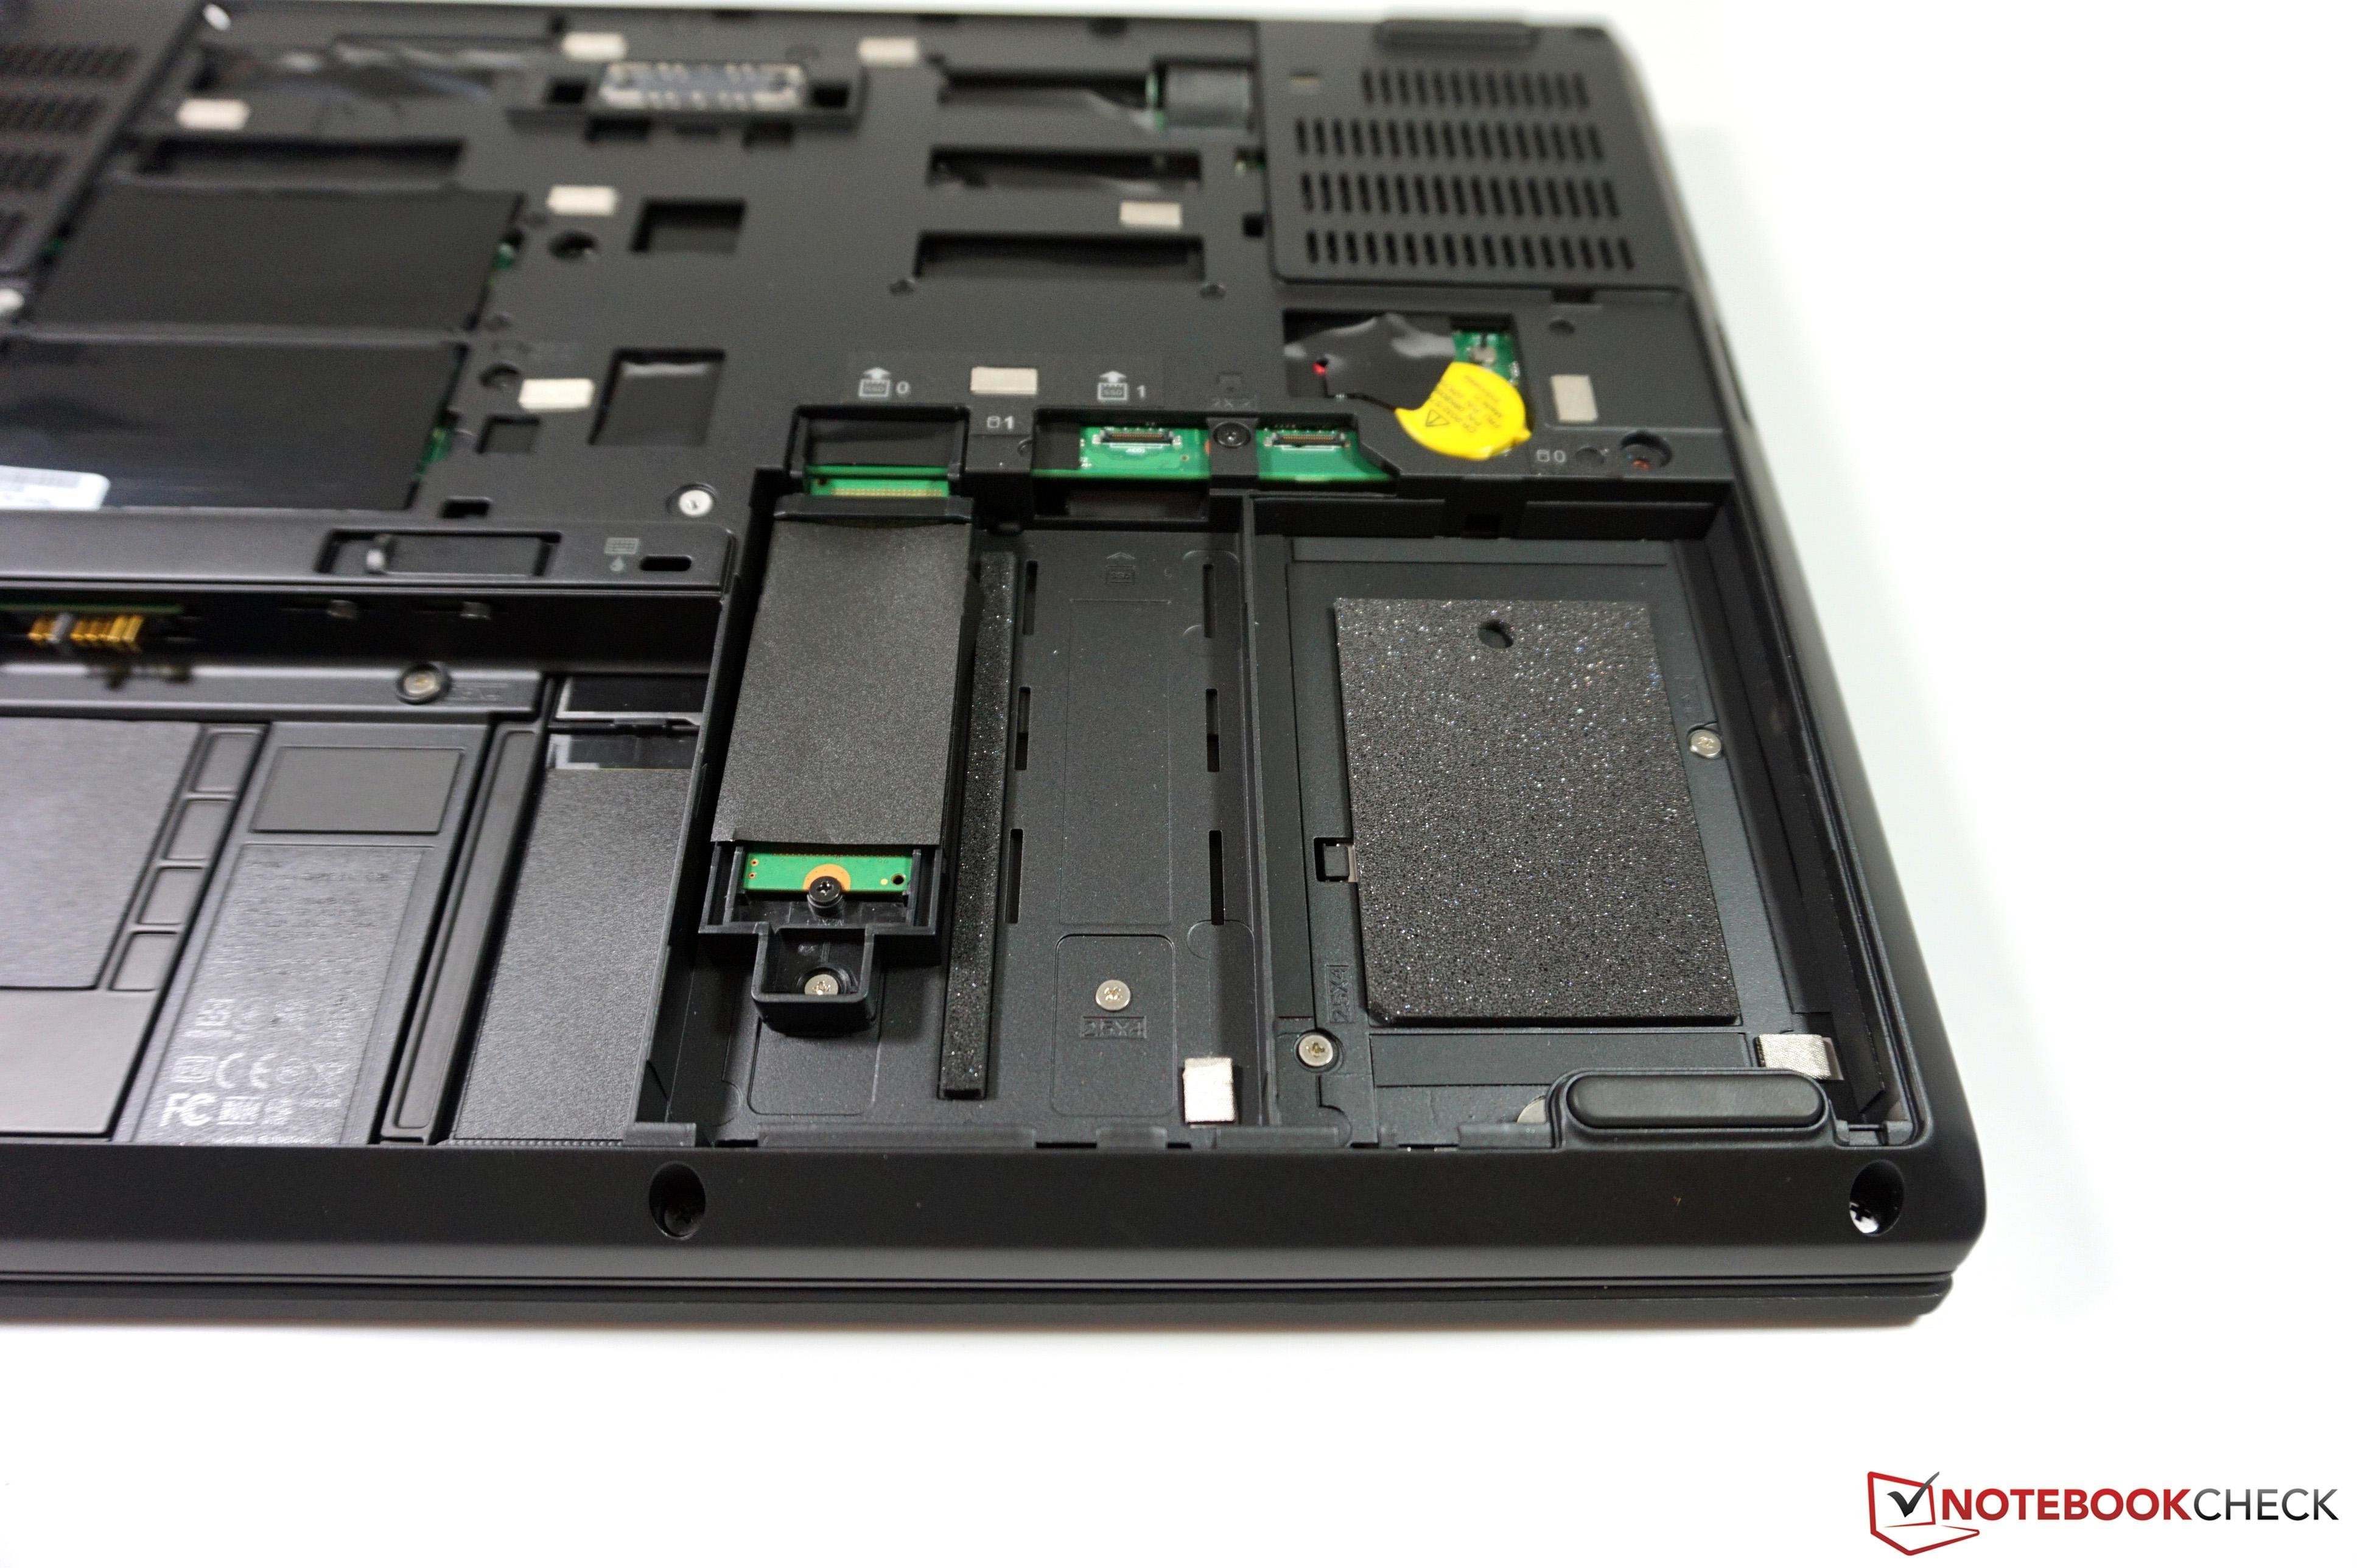 Lenovo ThinkPad P50 Workstation (Xeon, 4K) Review